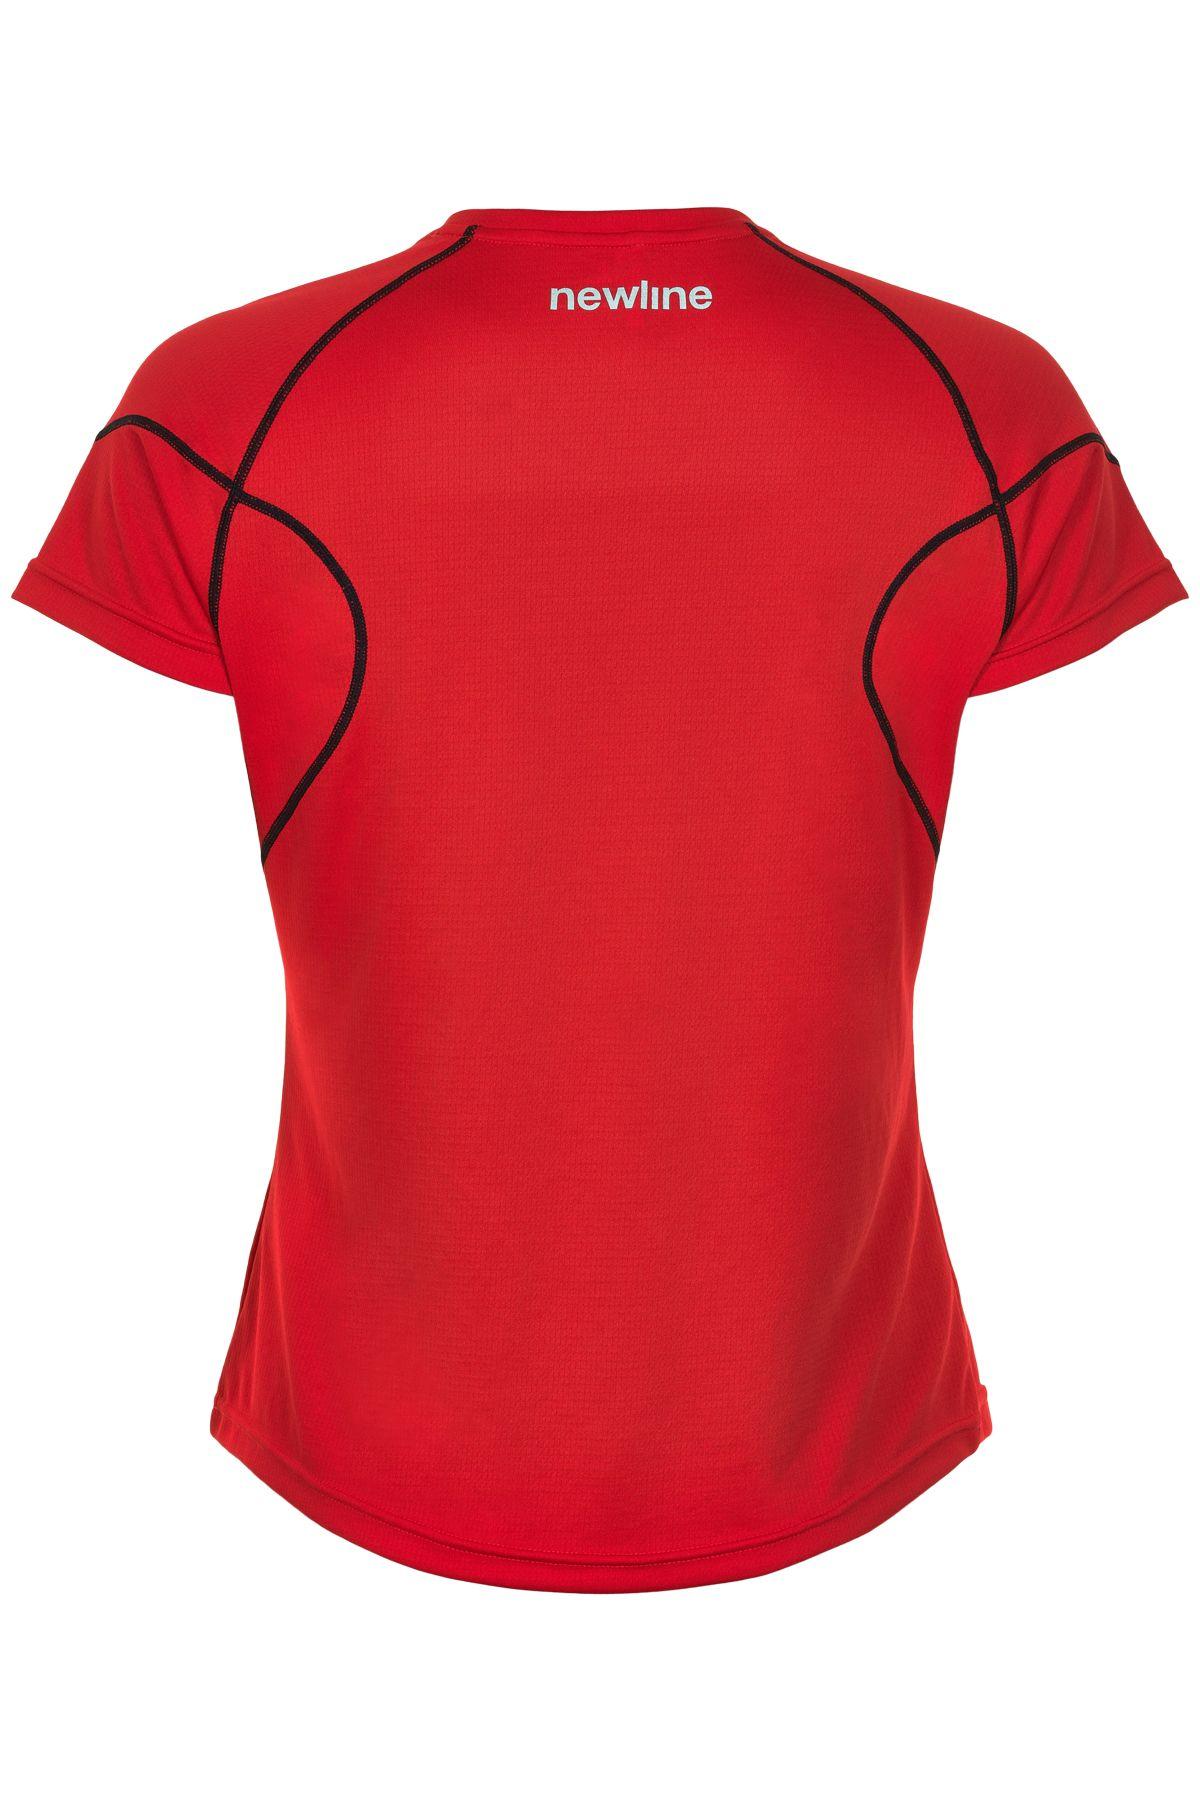 Newline W Core Coolskin t-shirt, red, x-small